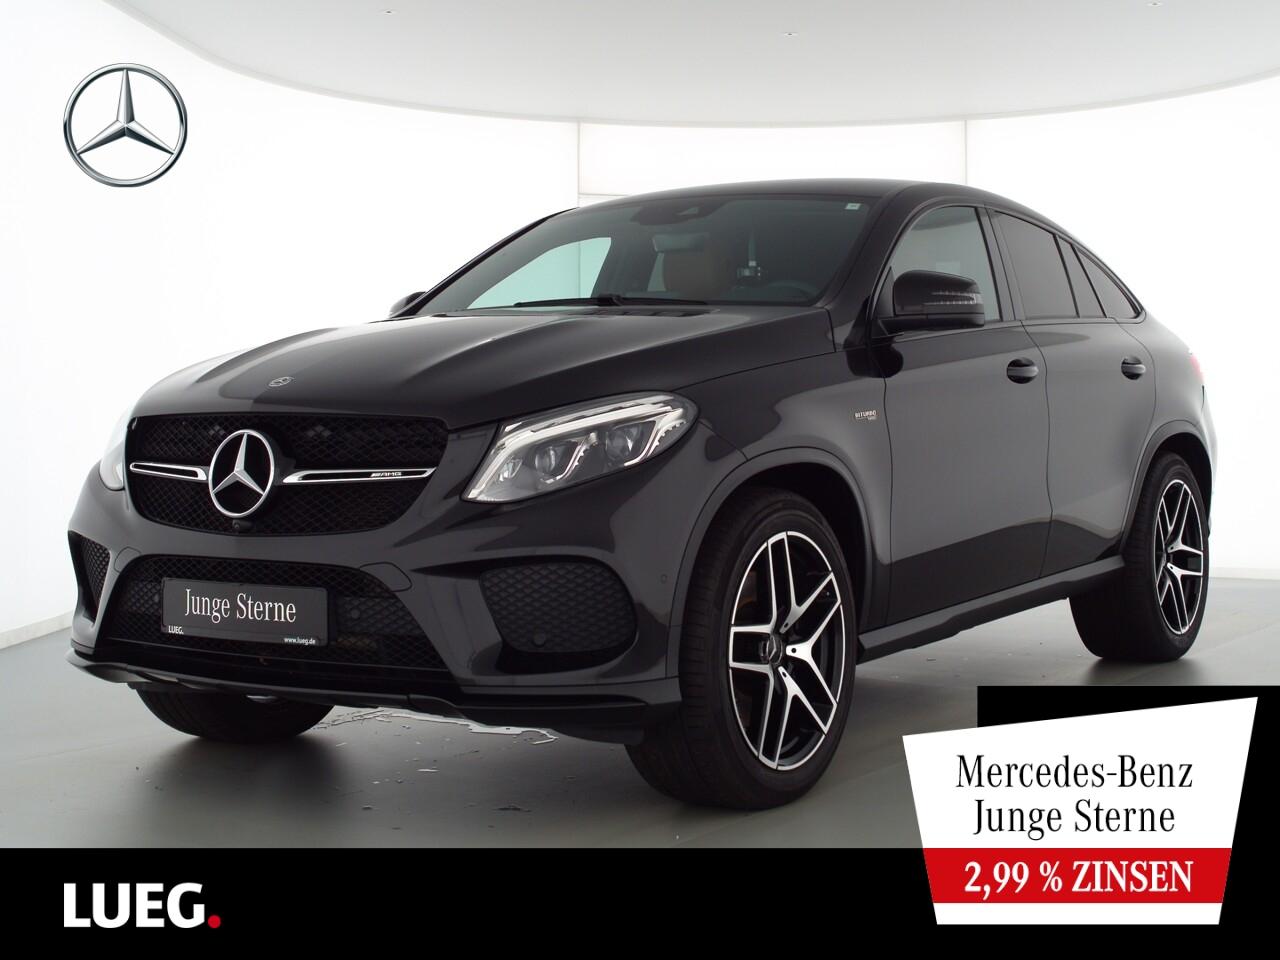 Mercedes-Benz GLE 43 AMG 4M Coupe COM+LED-ILS+Air+21+Night+360, Jahr 2019, Benzin